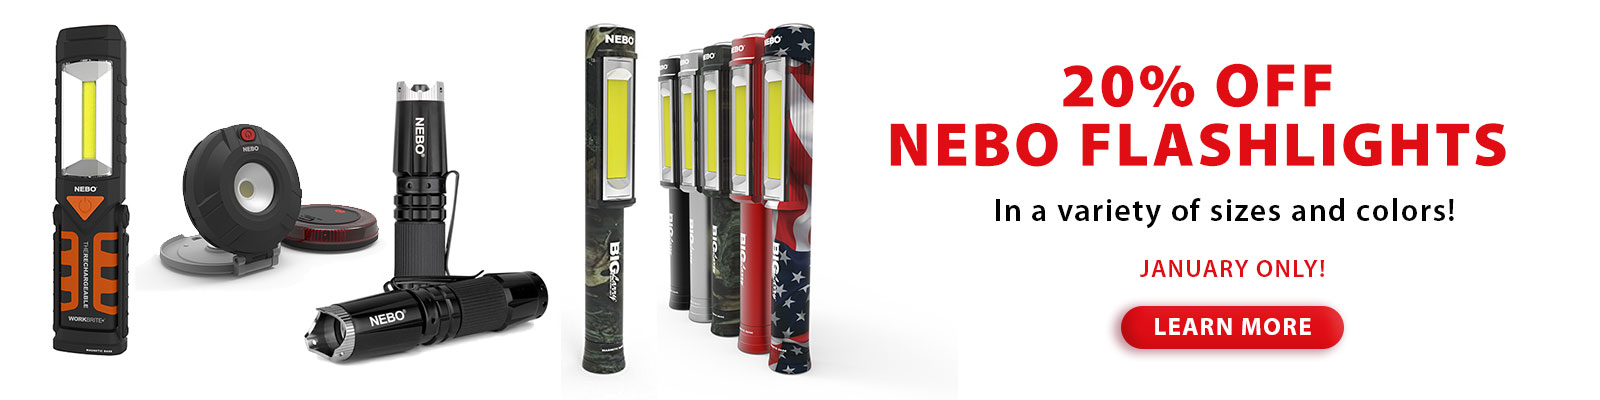 NEBO Flashlight Sale